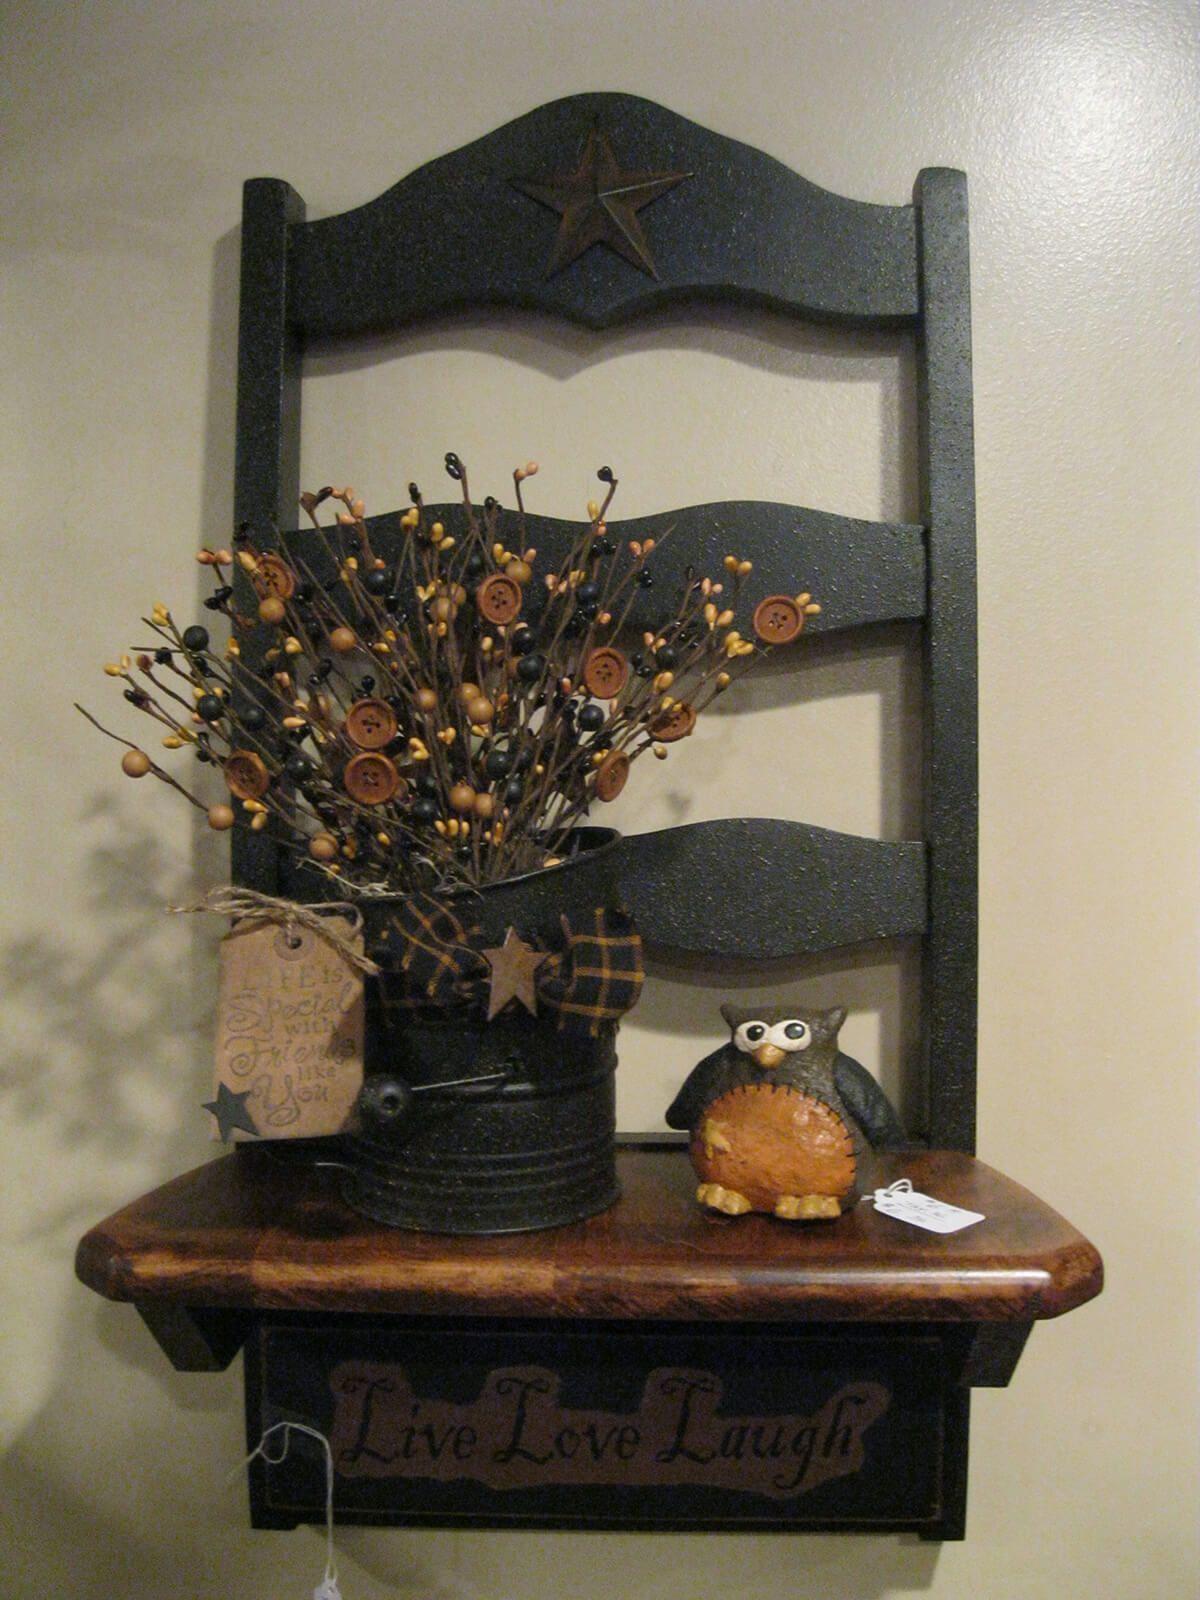 Shabby Gartendeko Genial A Mantle with Flowers and An Owl